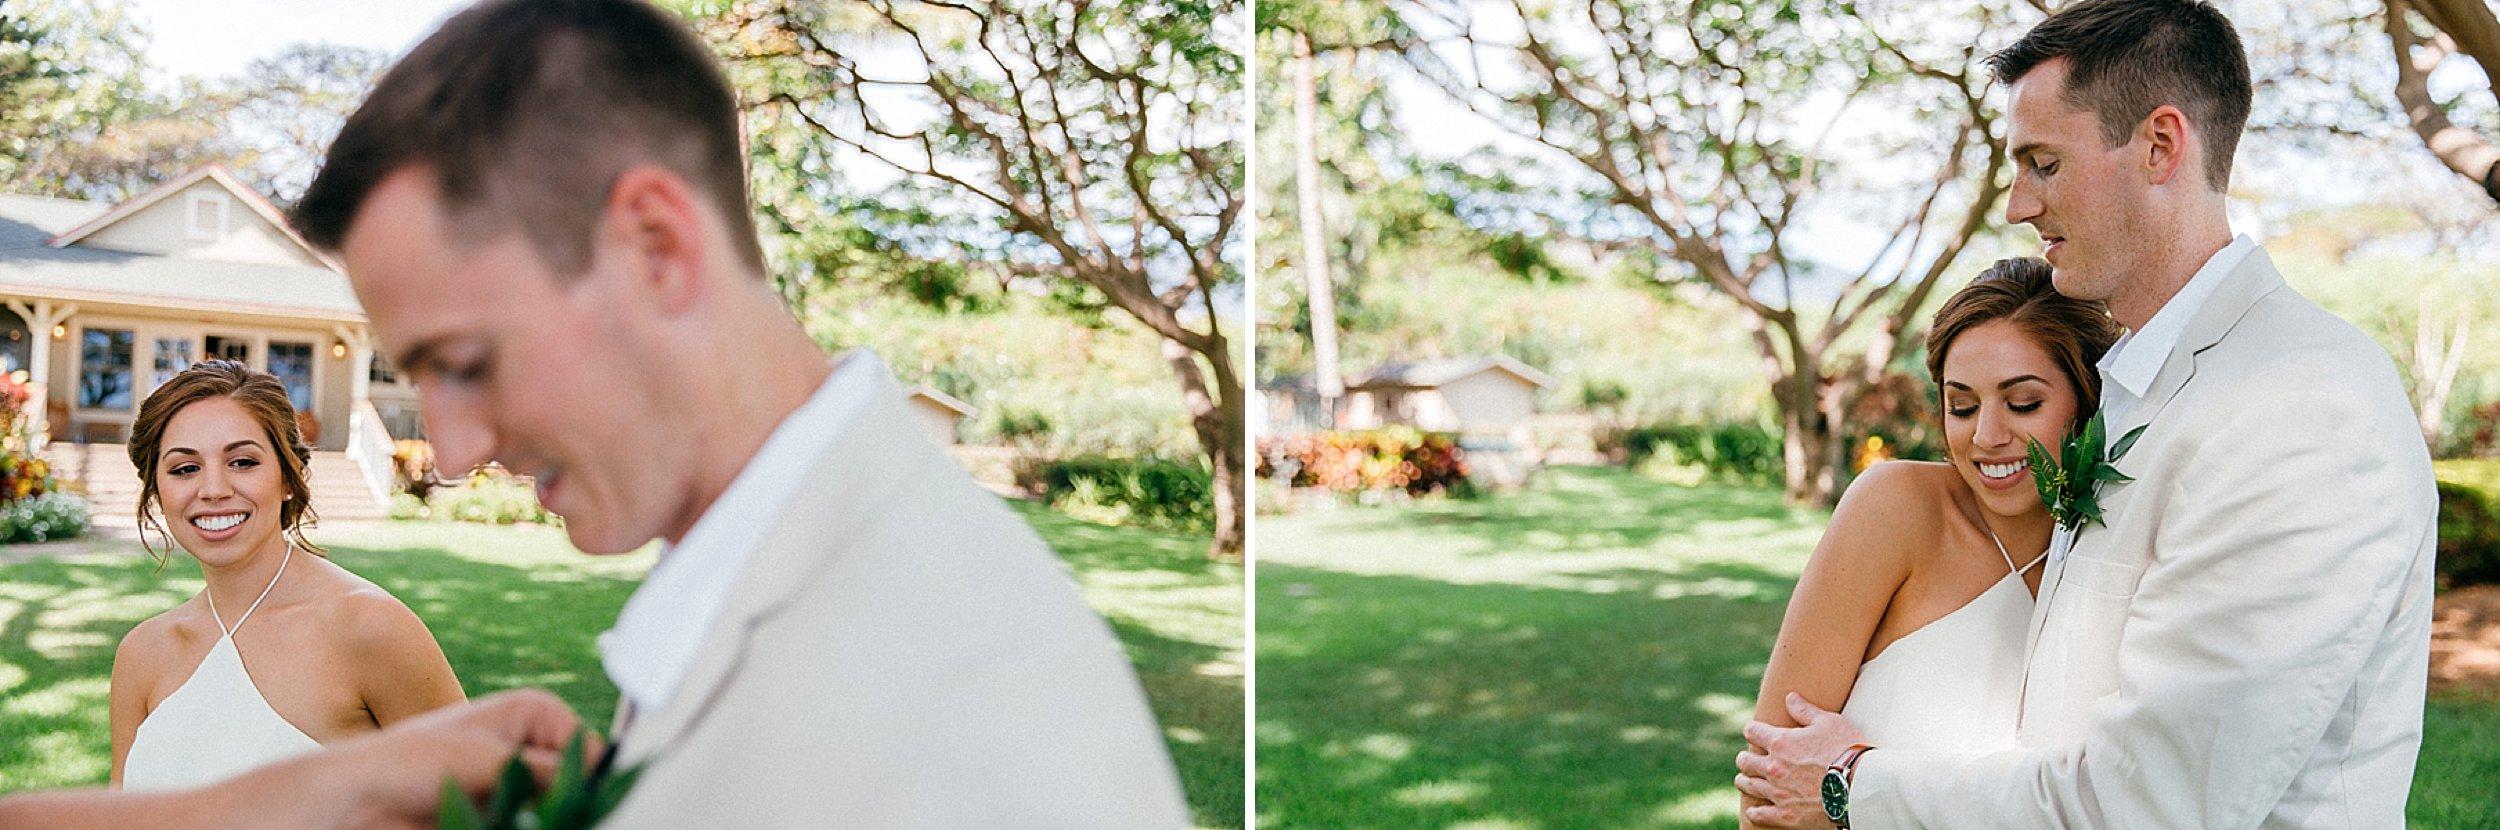 maui-wedding-at-olowalu-plantation-house_0036.jpg